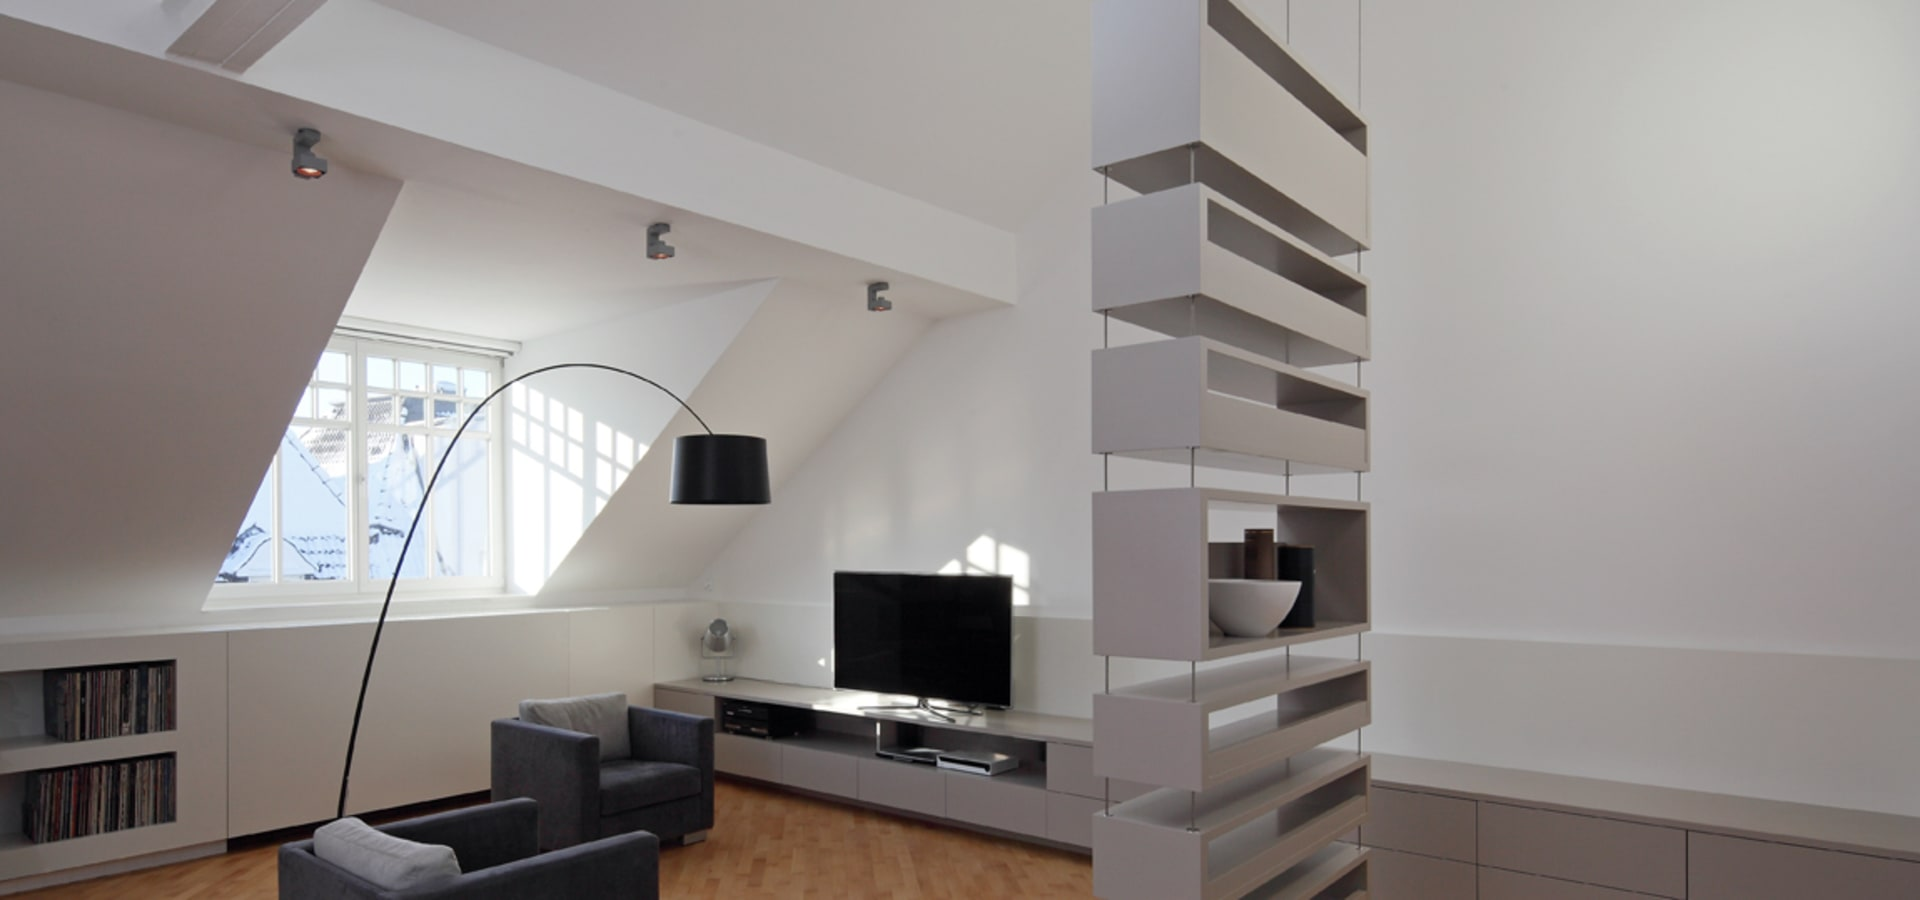 privathaus heidelberg por raumkontor innenarchitektur. Black Bedroom Furniture Sets. Home Design Ideas